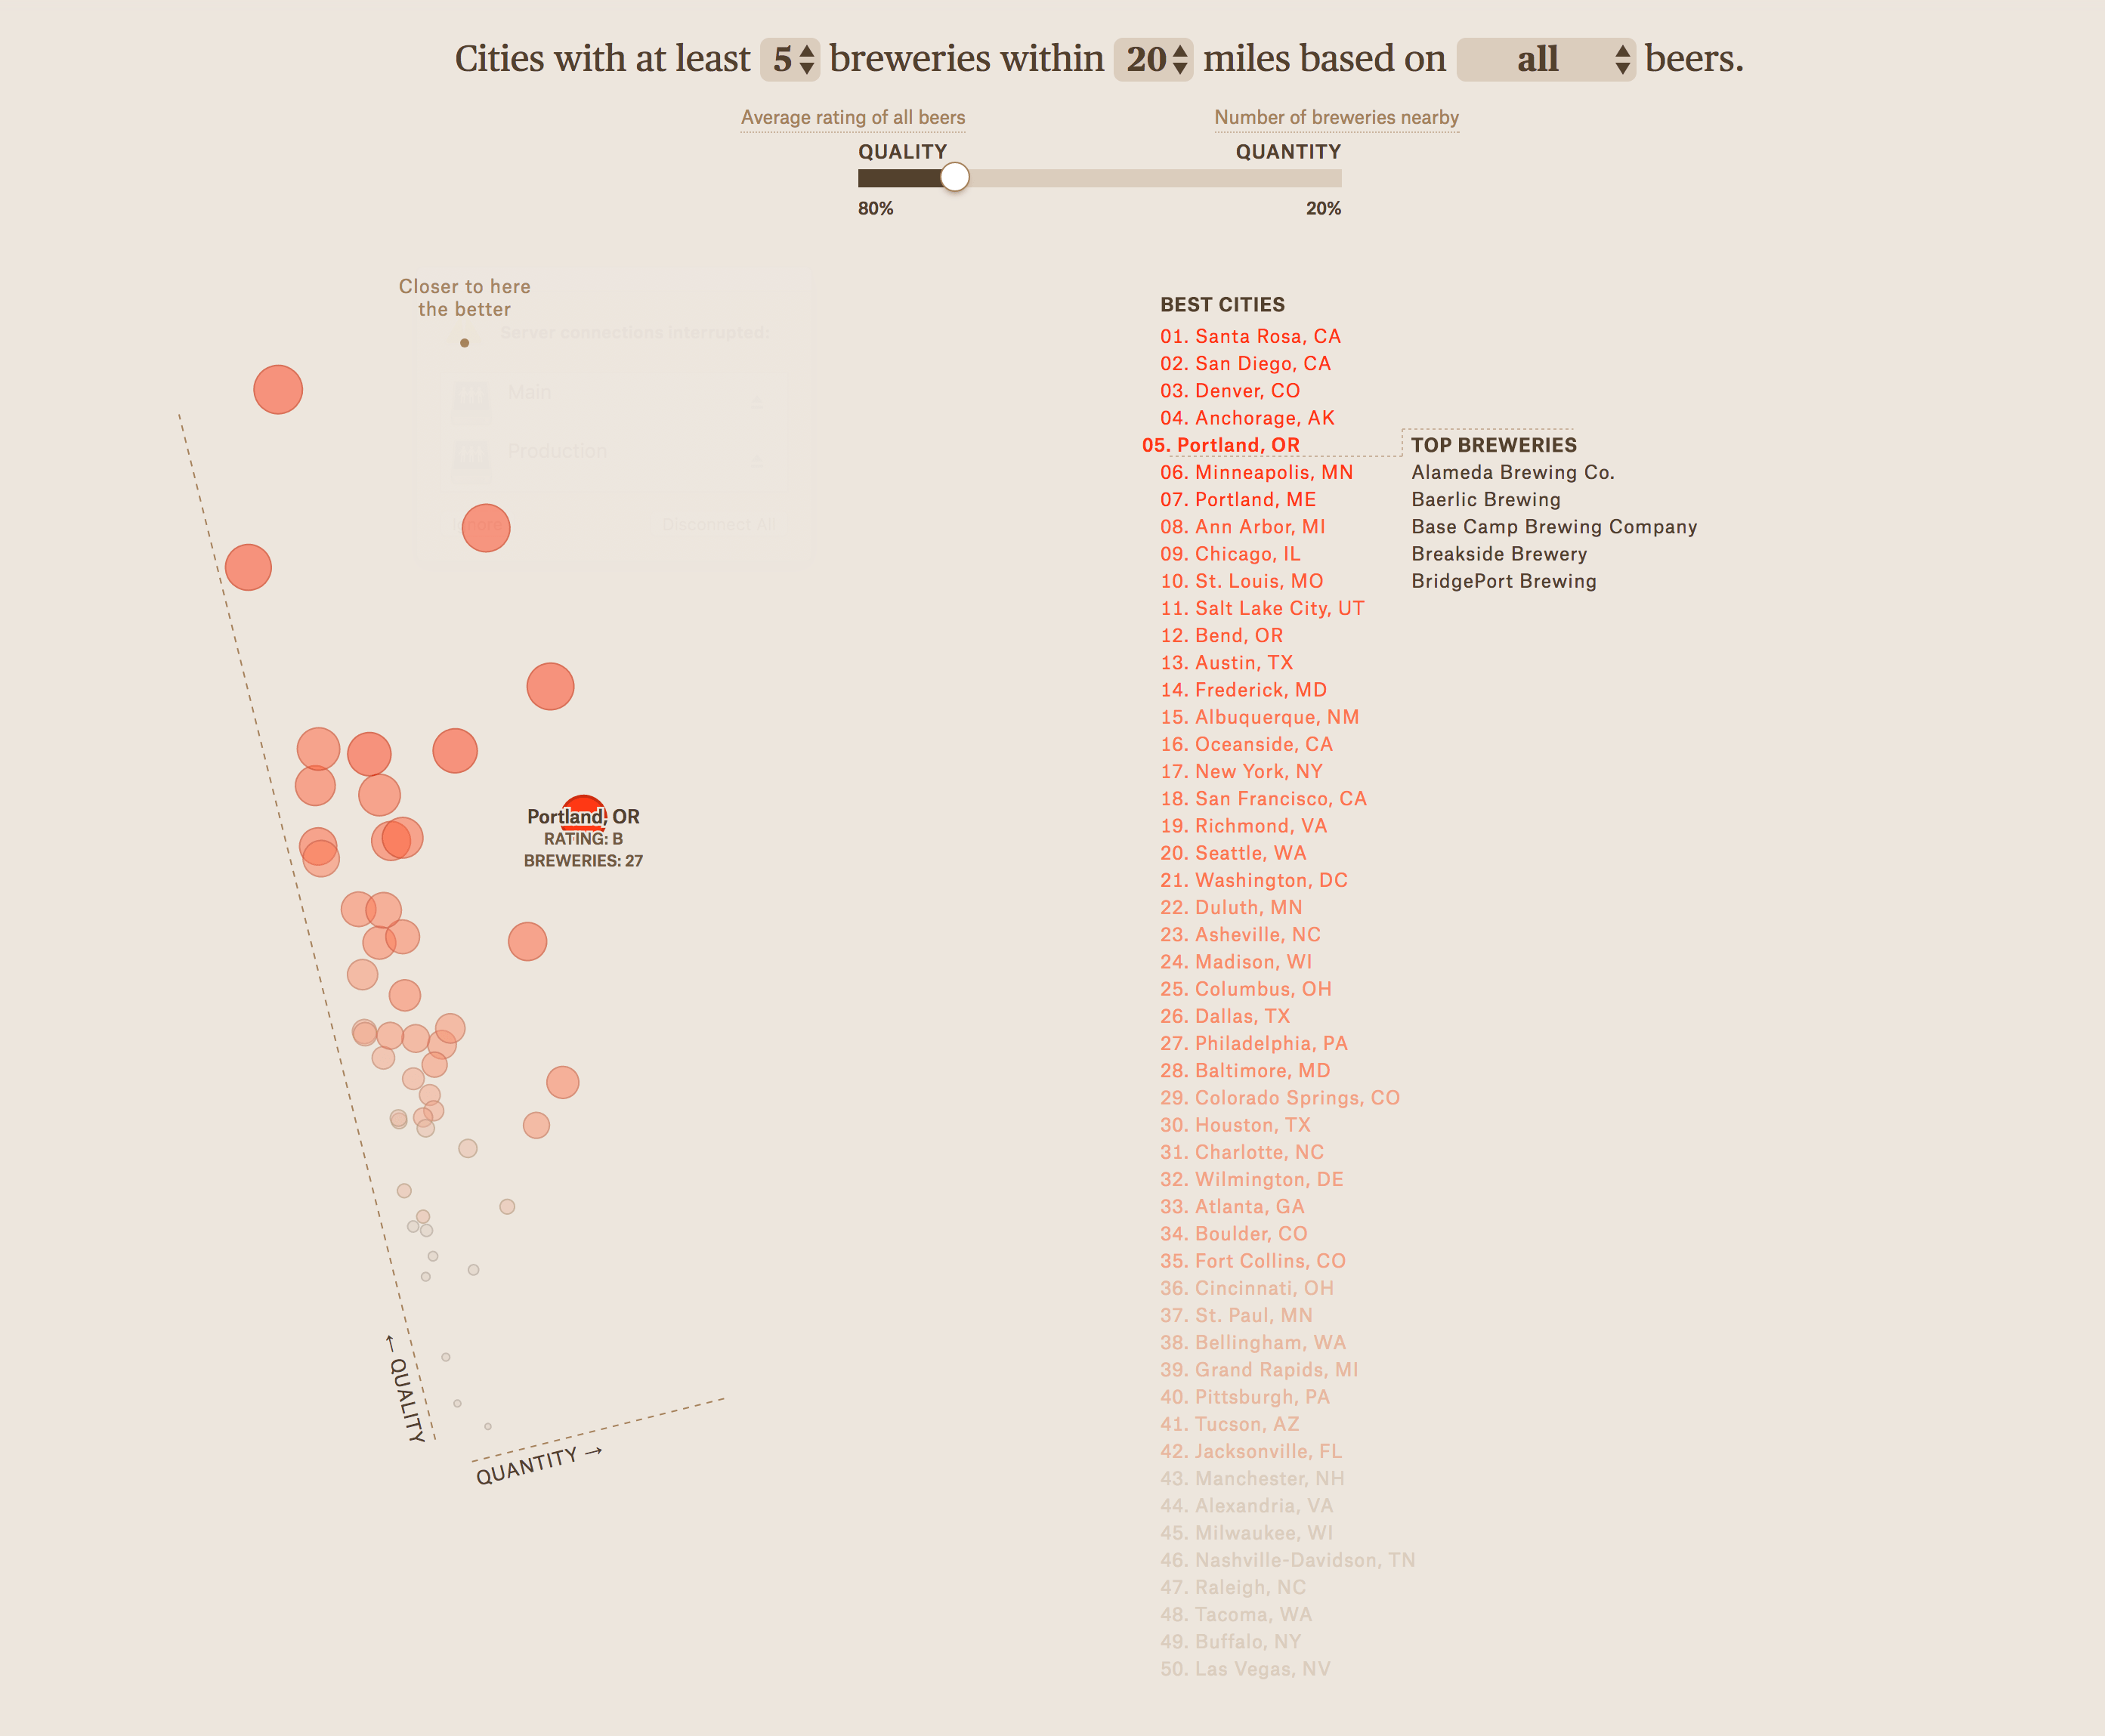 Great Data Visualization - Microbreweries